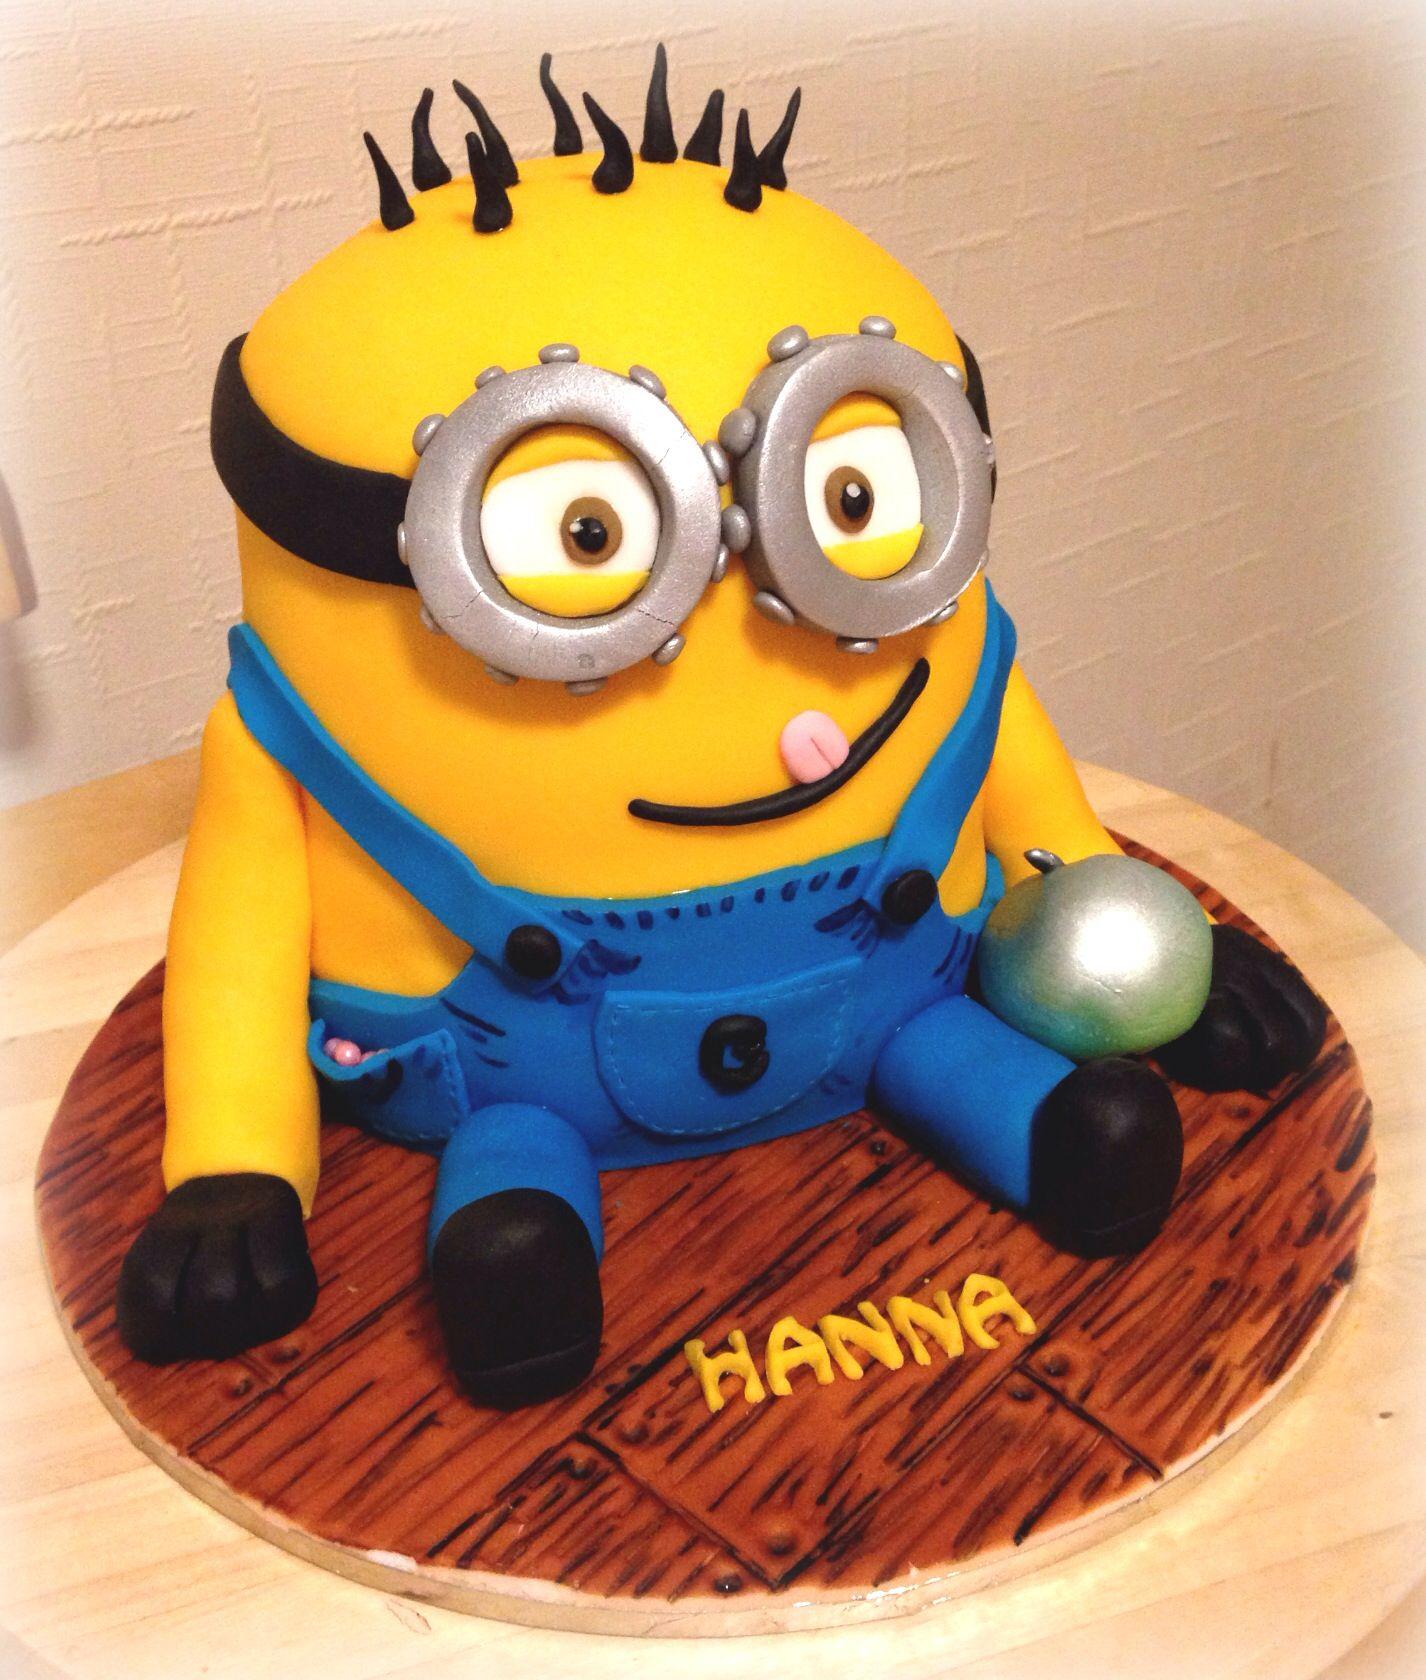 Minion Cake Design Pinterest : Minion cake :) Fondant Cake Pinterest